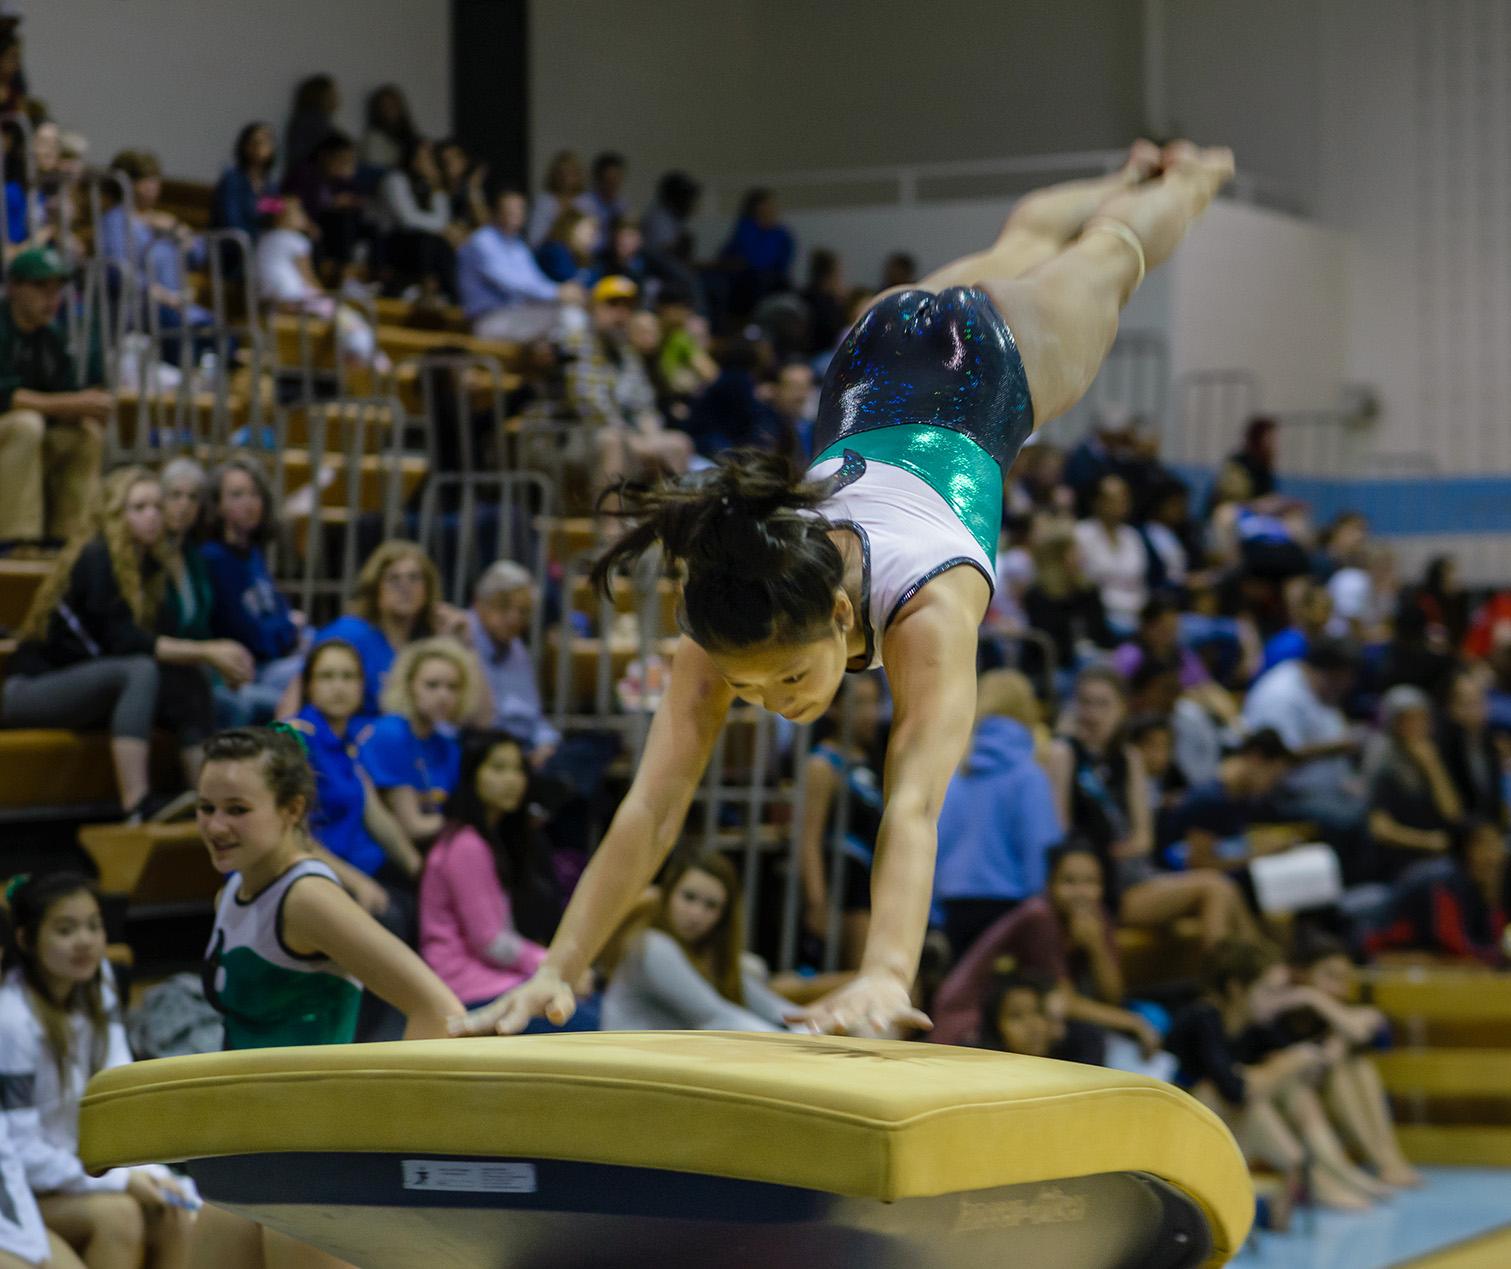 Winwin gymnastics - Walter Johnson High School Gymnast In The County Championship Competition